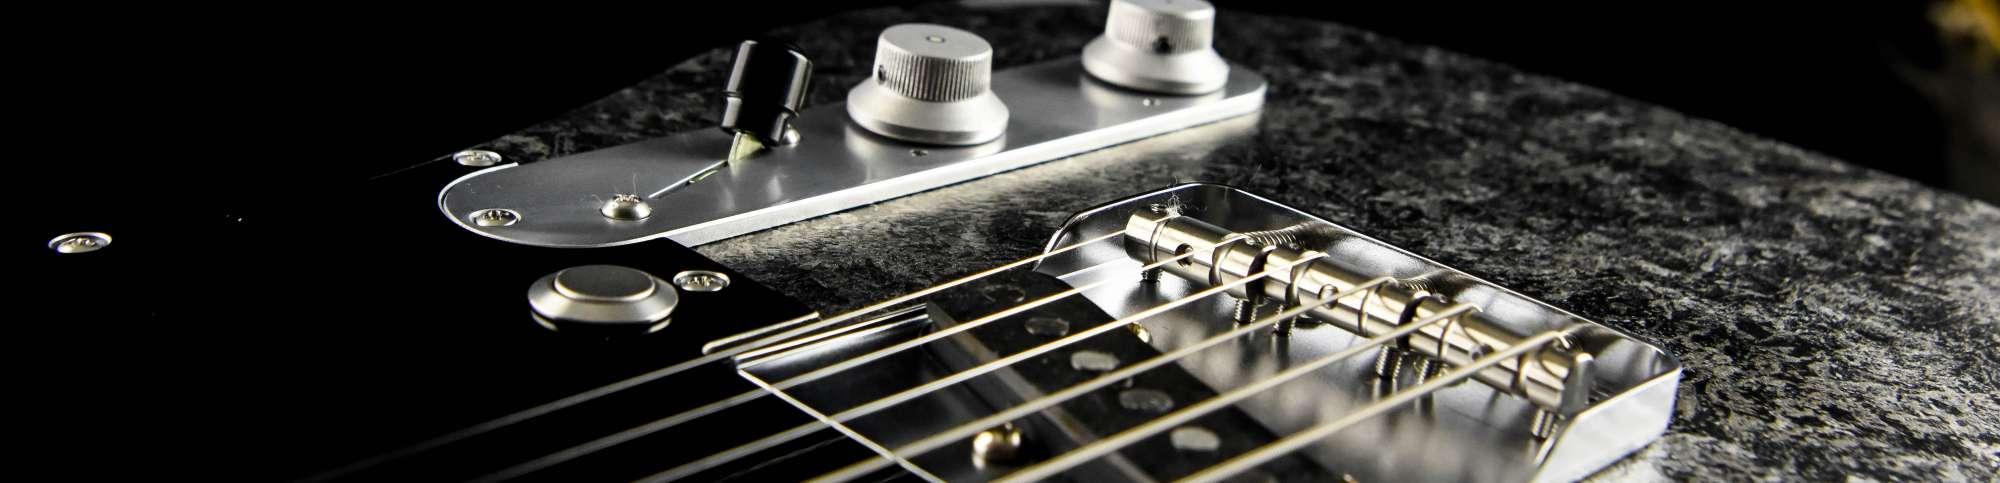 Versatile T-style guitar - Cyan Custom Guitars